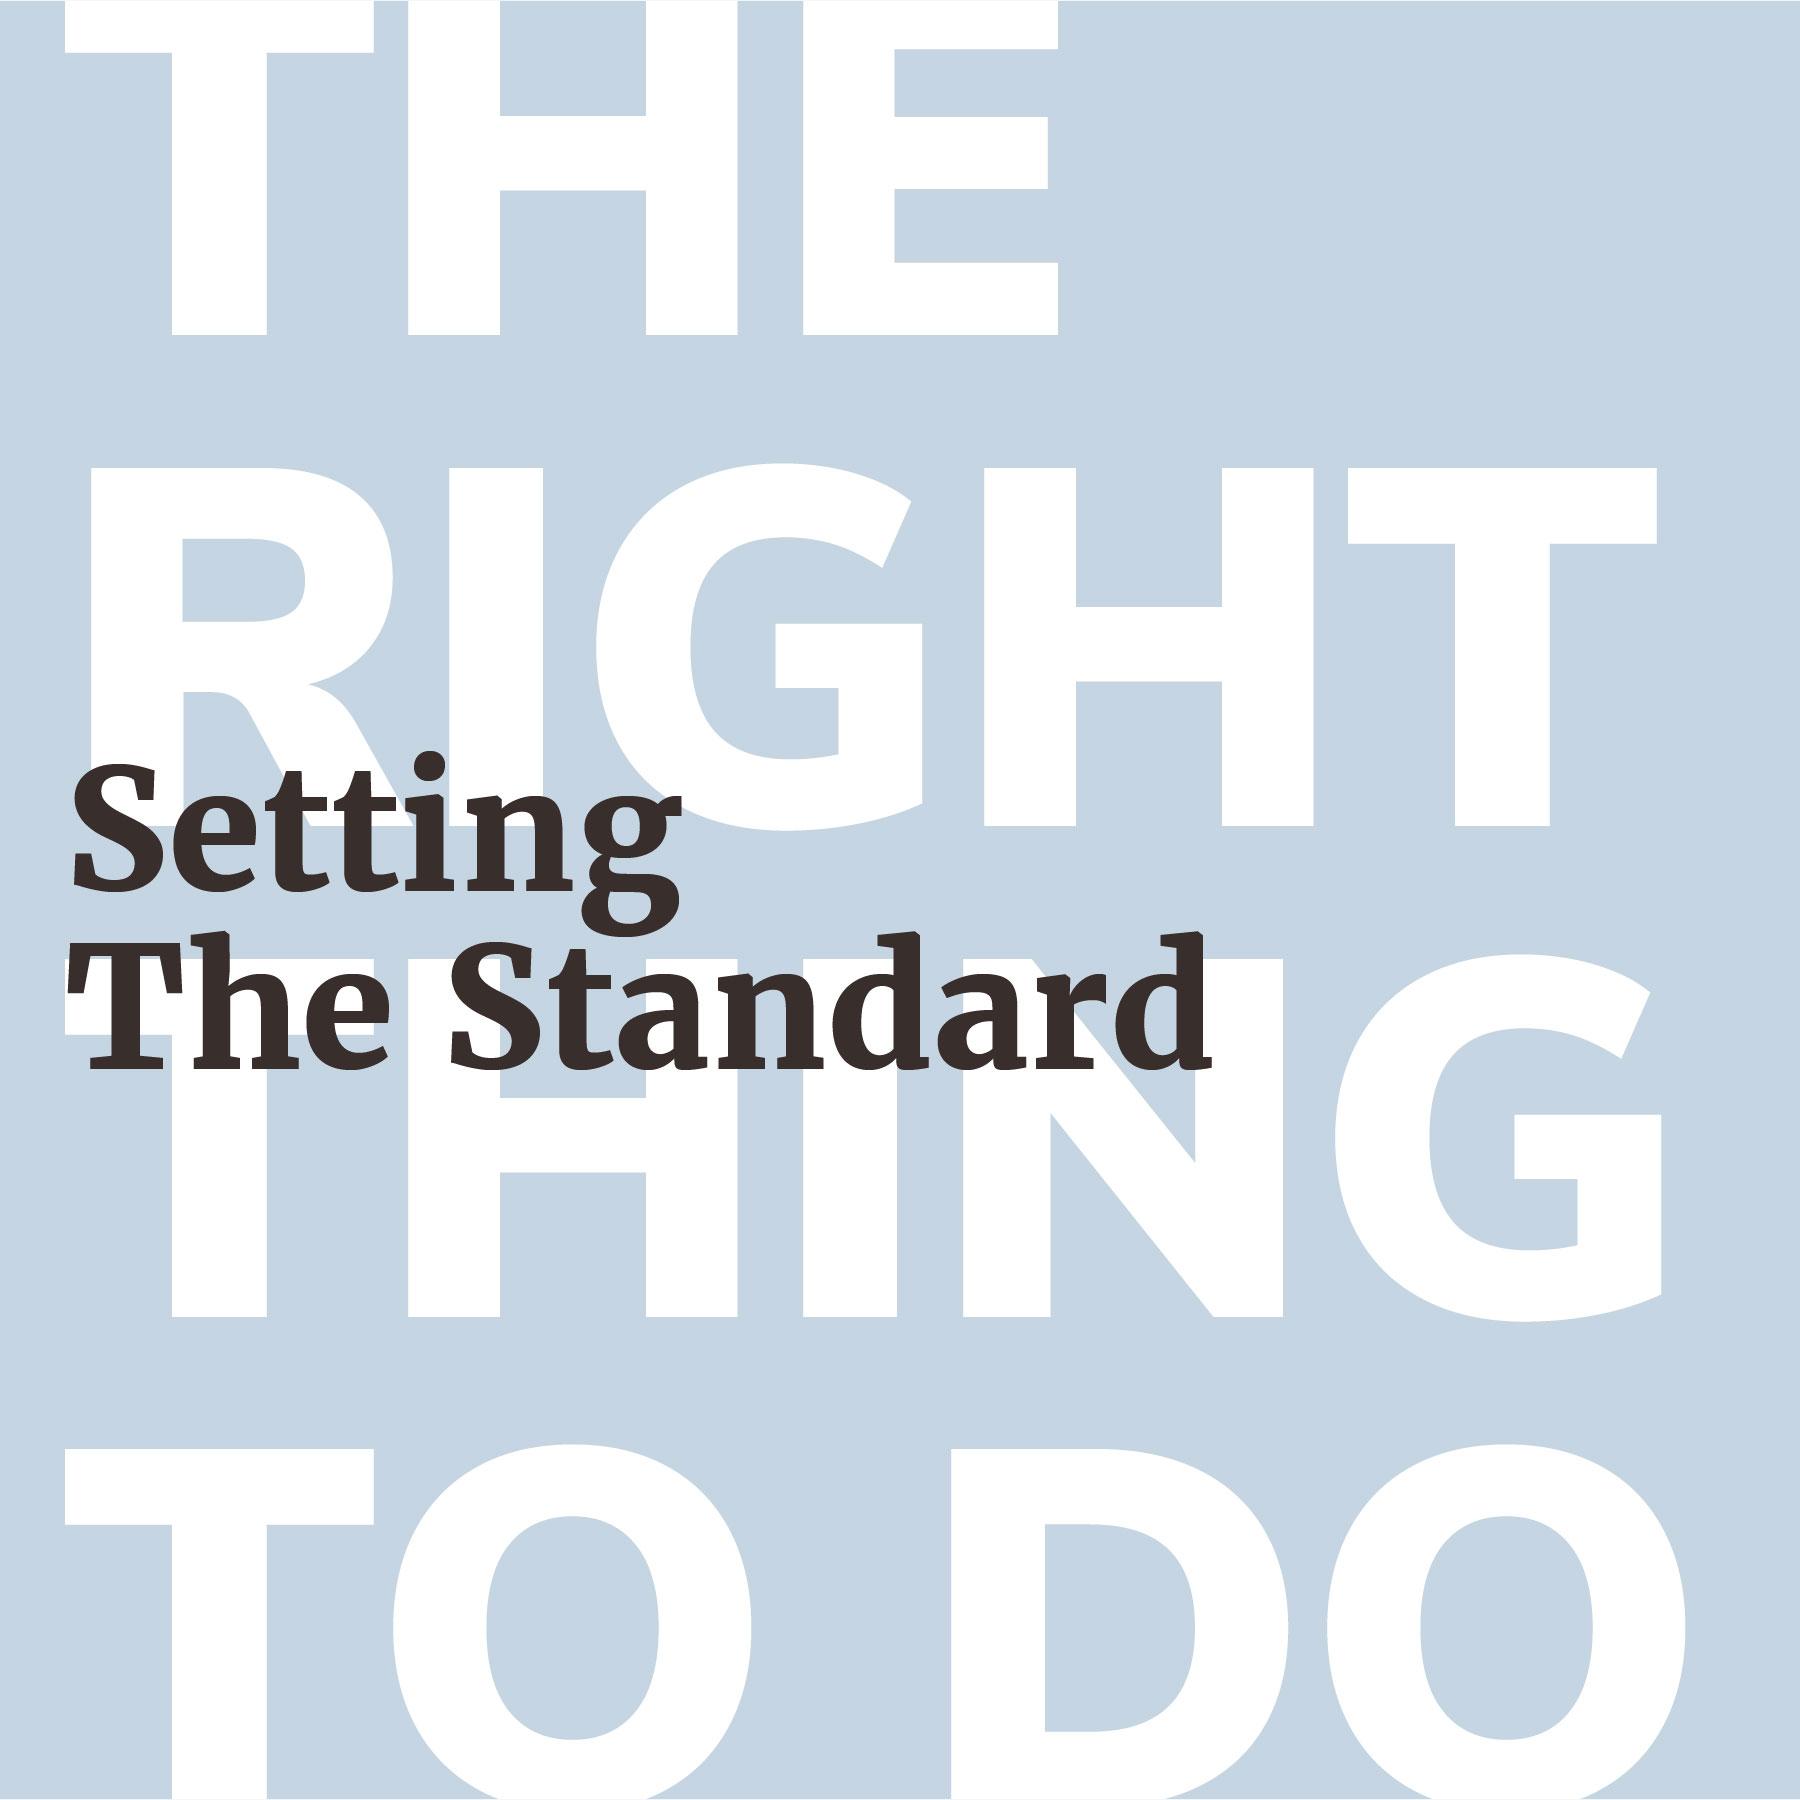 AFCPE Social Media-Setting The Standard.jpg